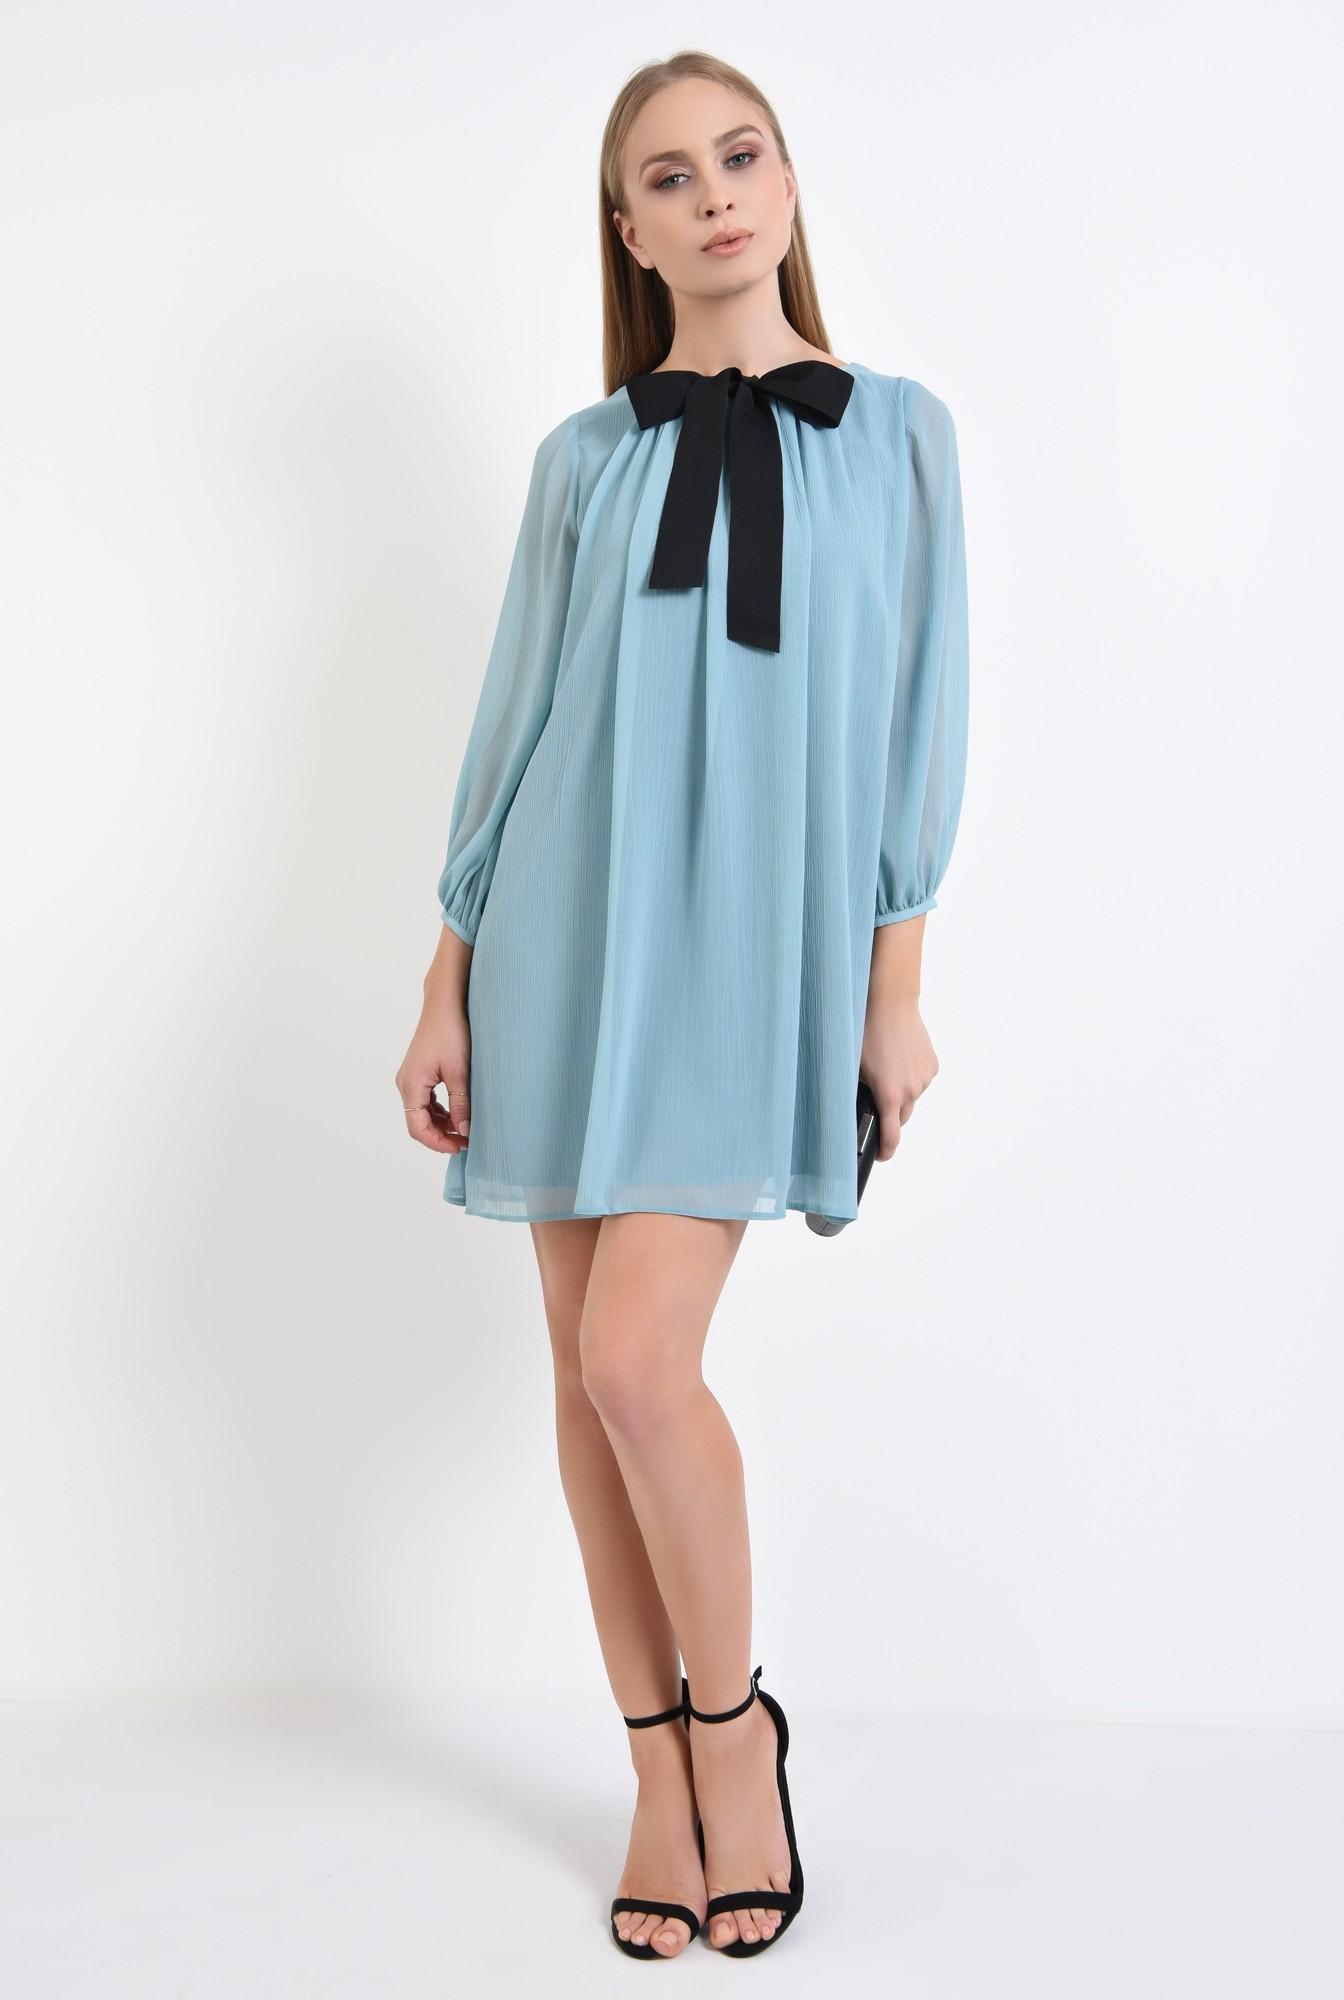 3 - rochie eleganta, bleu, rips, negru, contrast